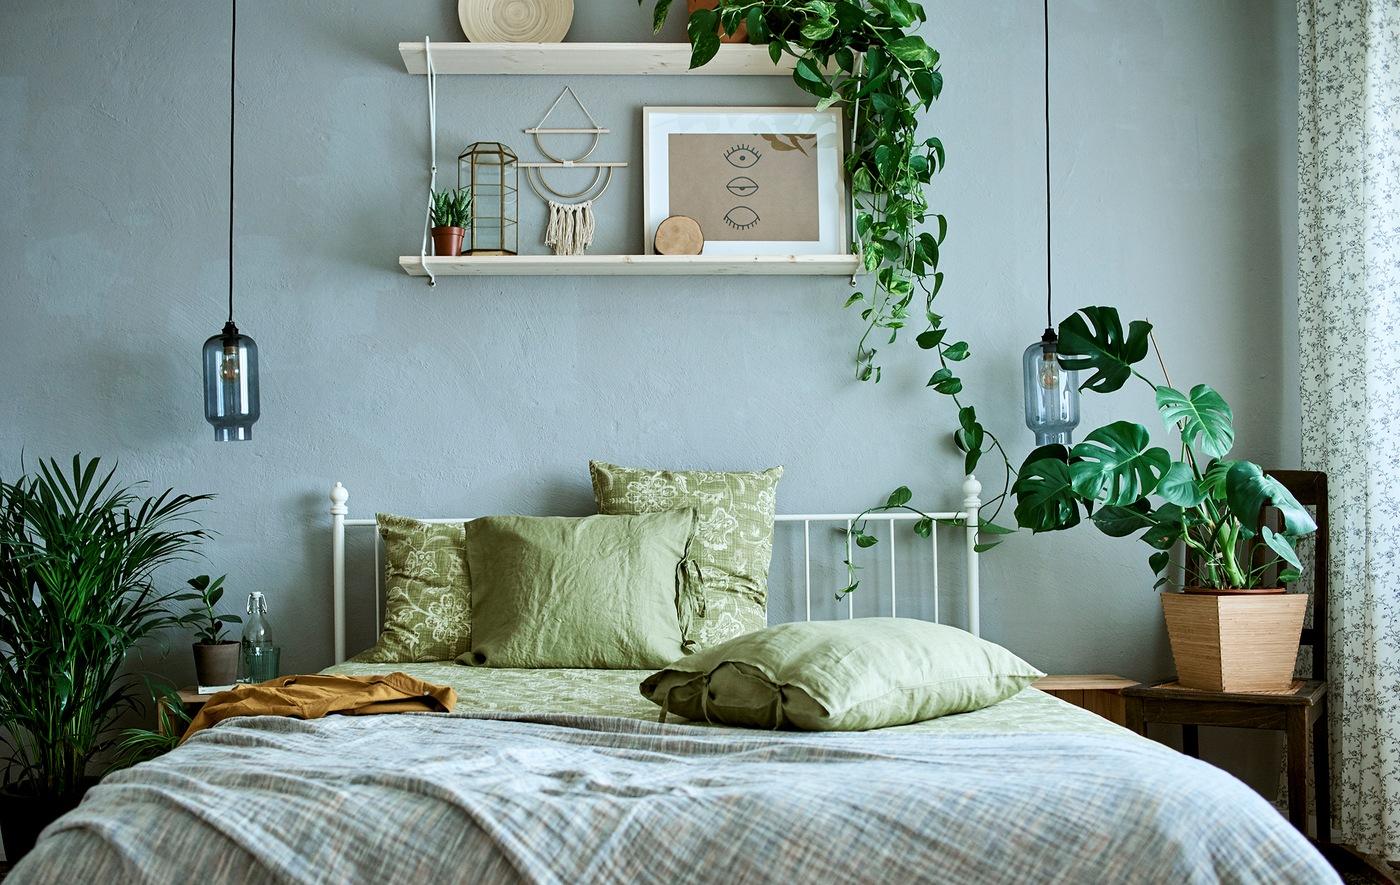 Rangka tempat tidur besi warna putih dengan seprai serta sarung bantal warna hijau polos dan bercorak di sebuah ruangan yang didekorasi tanaman dan karya seni.